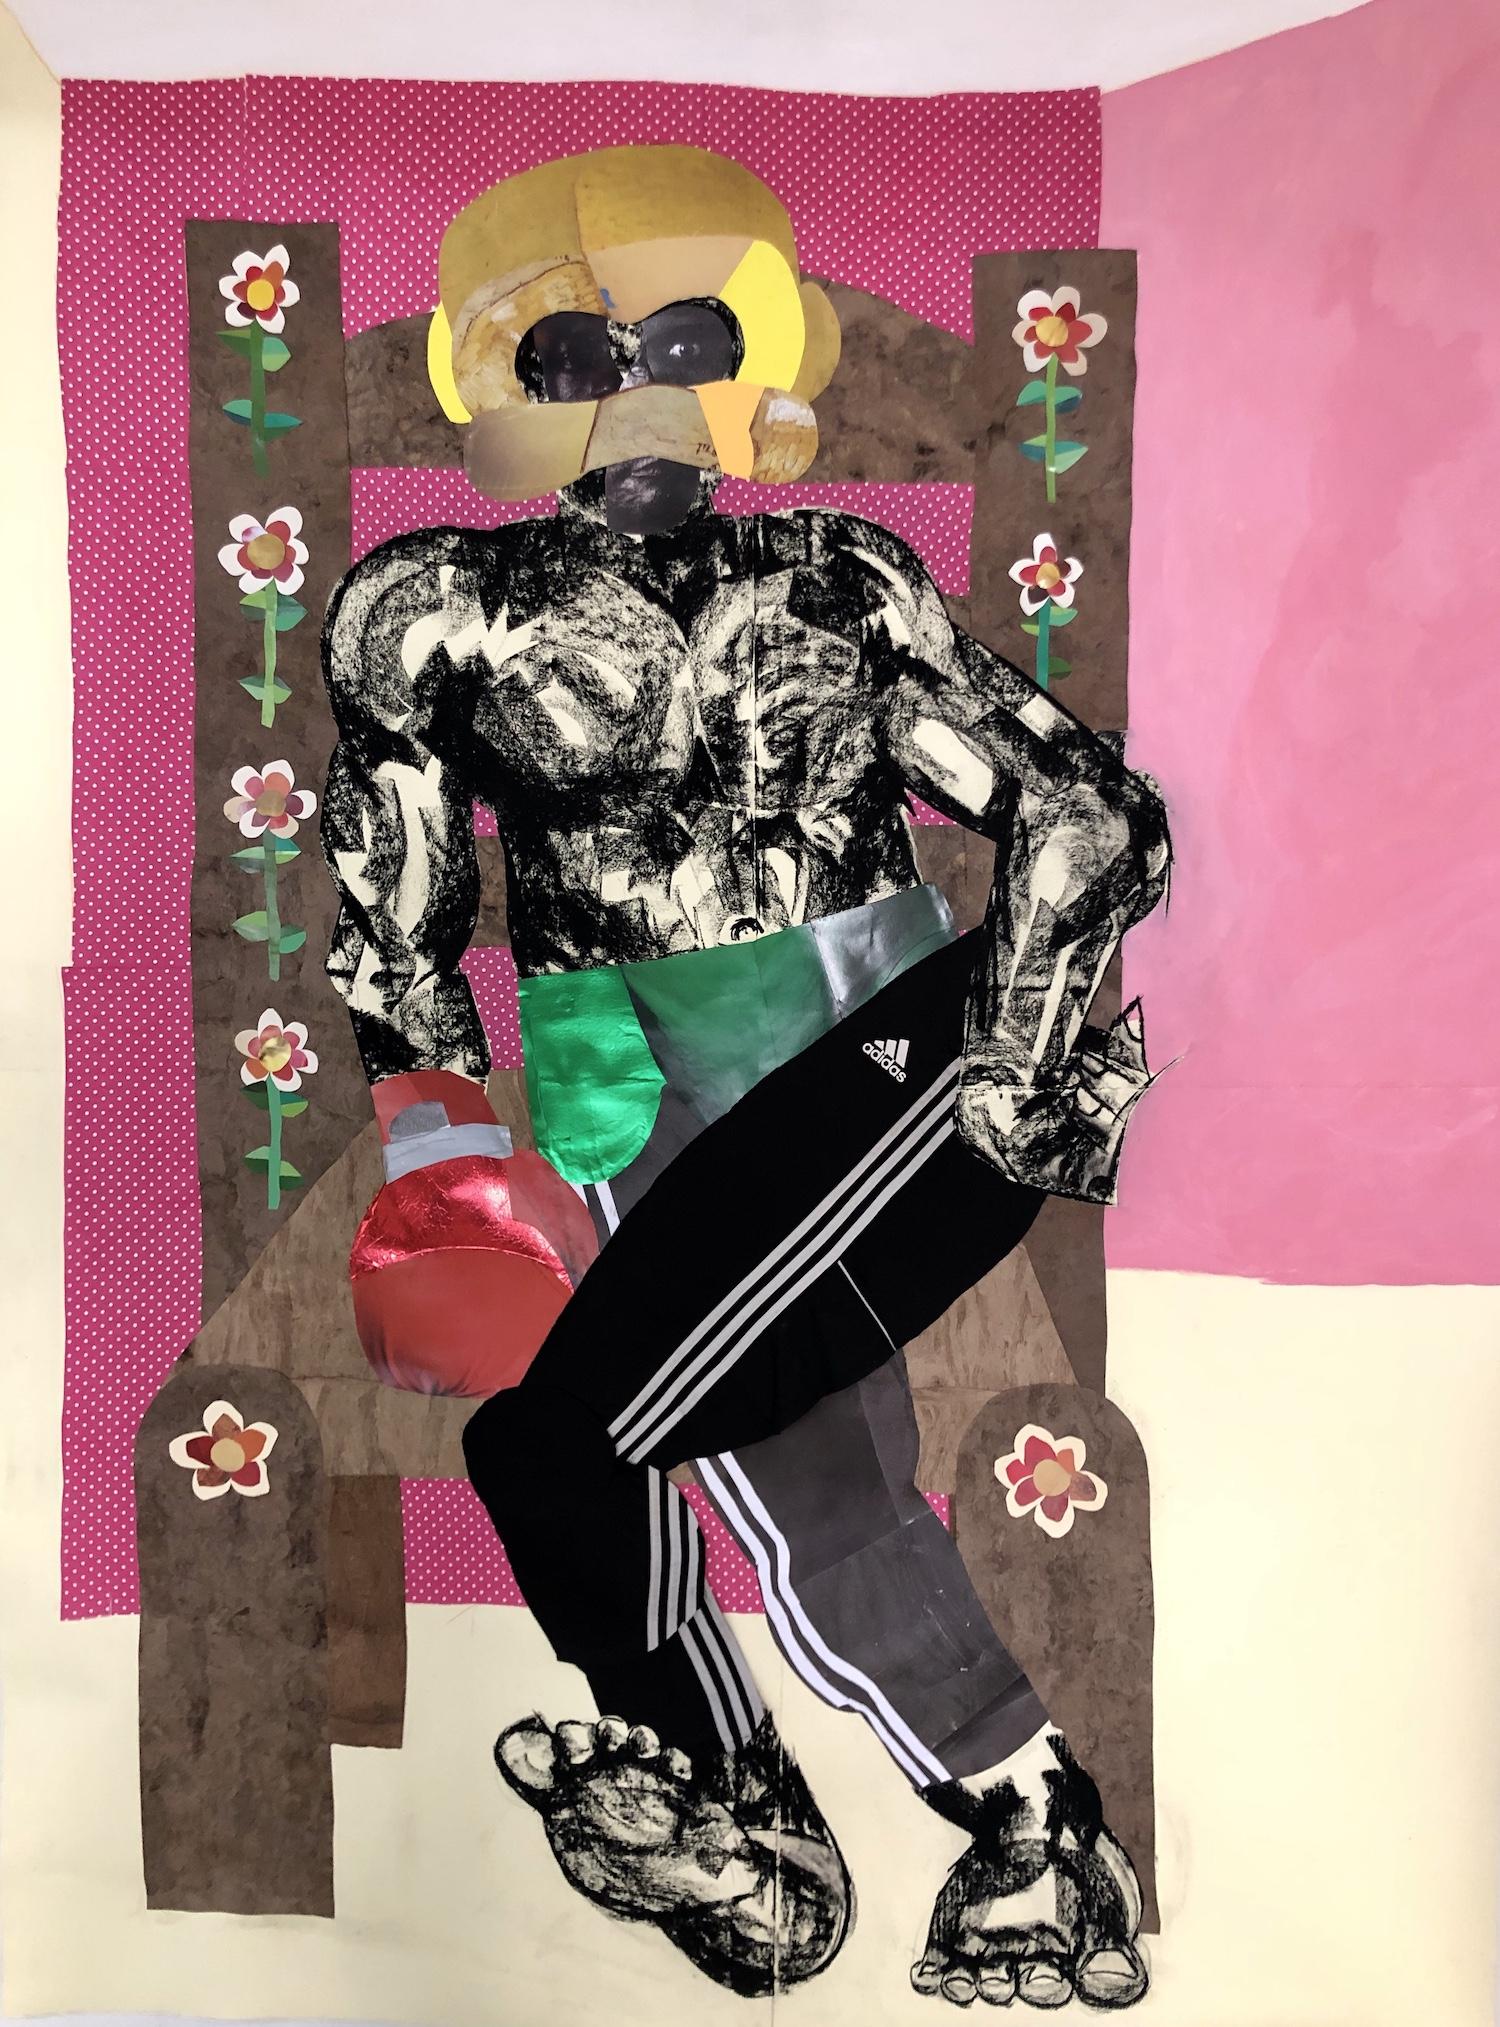 Clotilde-Jimenez-Always-On-Guard-2020-Courtesy-of-the-Artist-and-Mariane-Ibrahim-Gallery